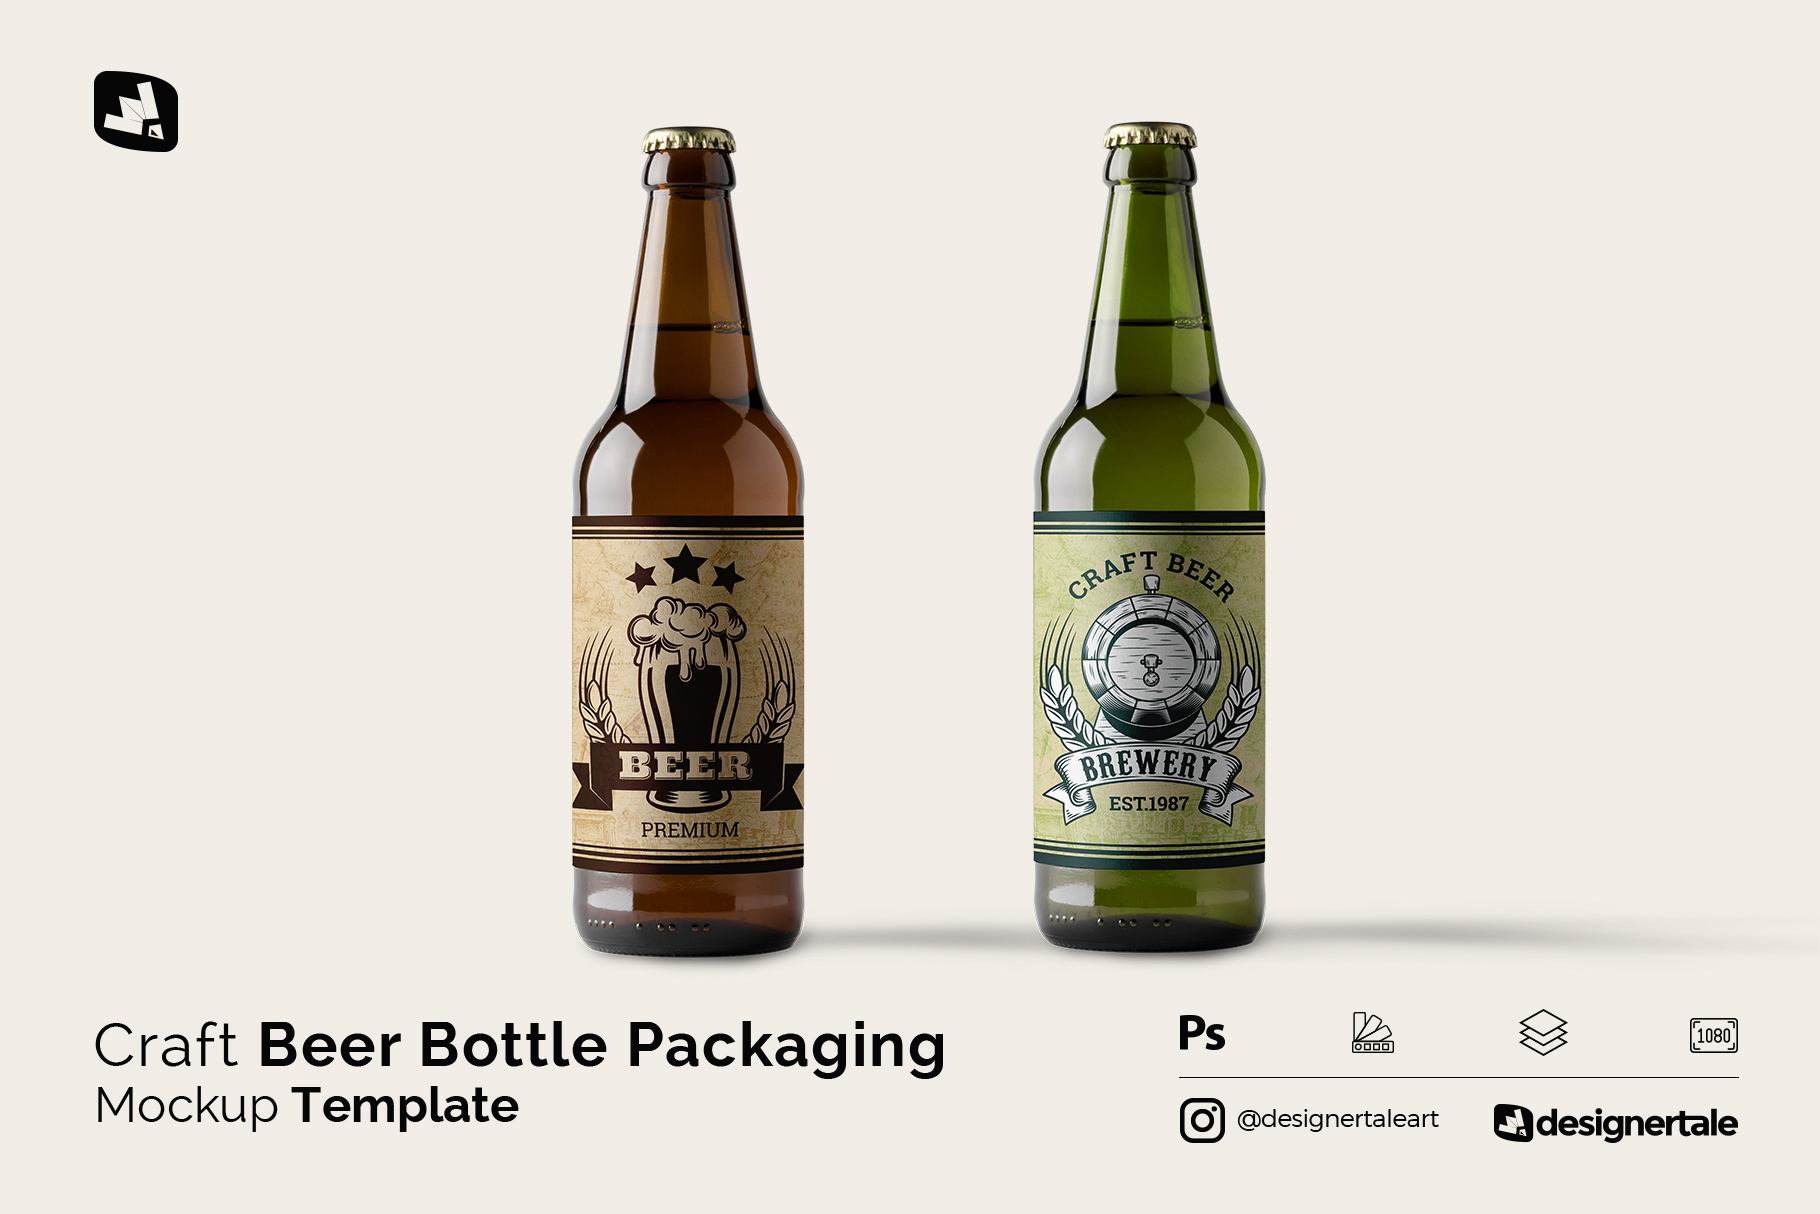 craft beer bottle packaging mockup